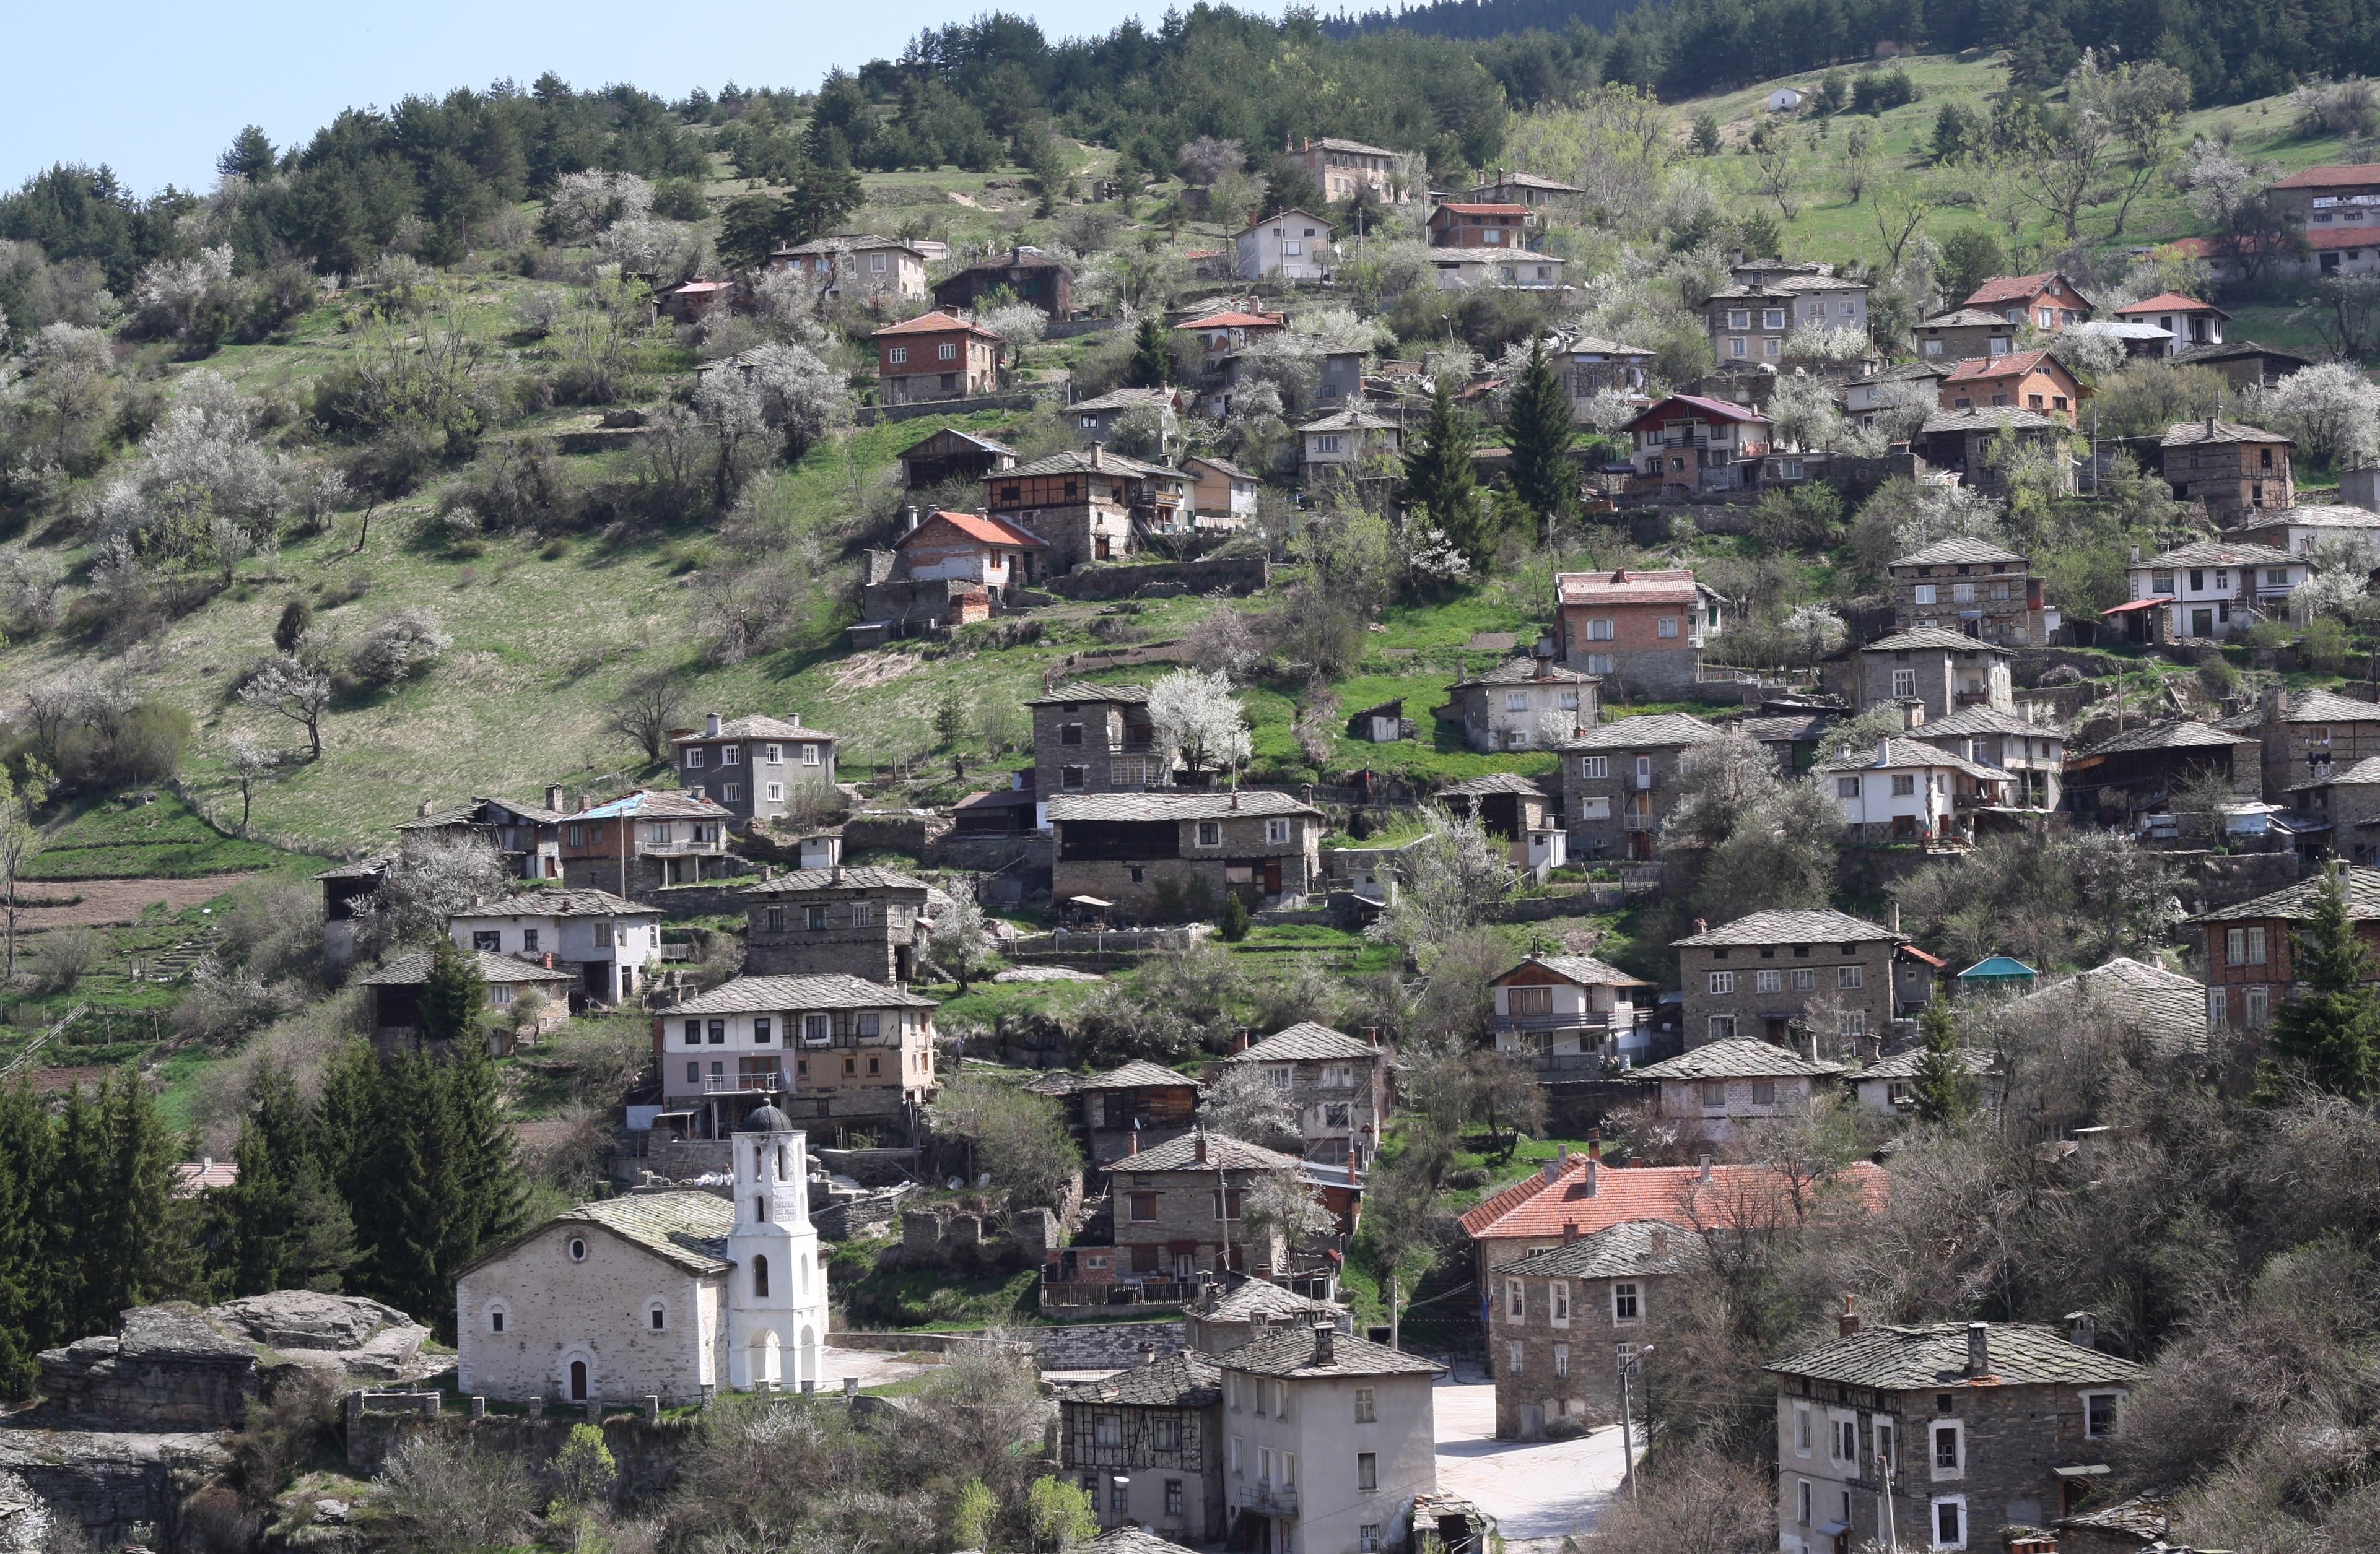 <p>Село Ситово, област Пловдив</p>